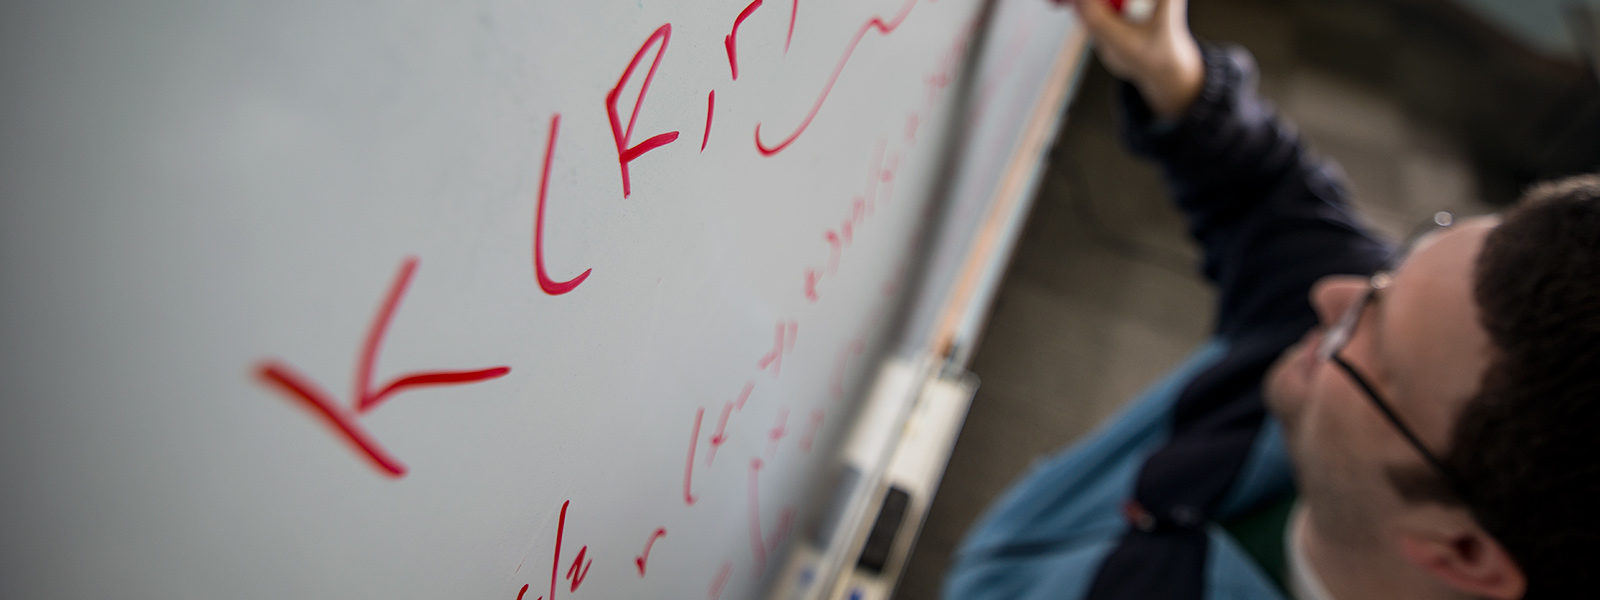 Whiteboard with math formulas